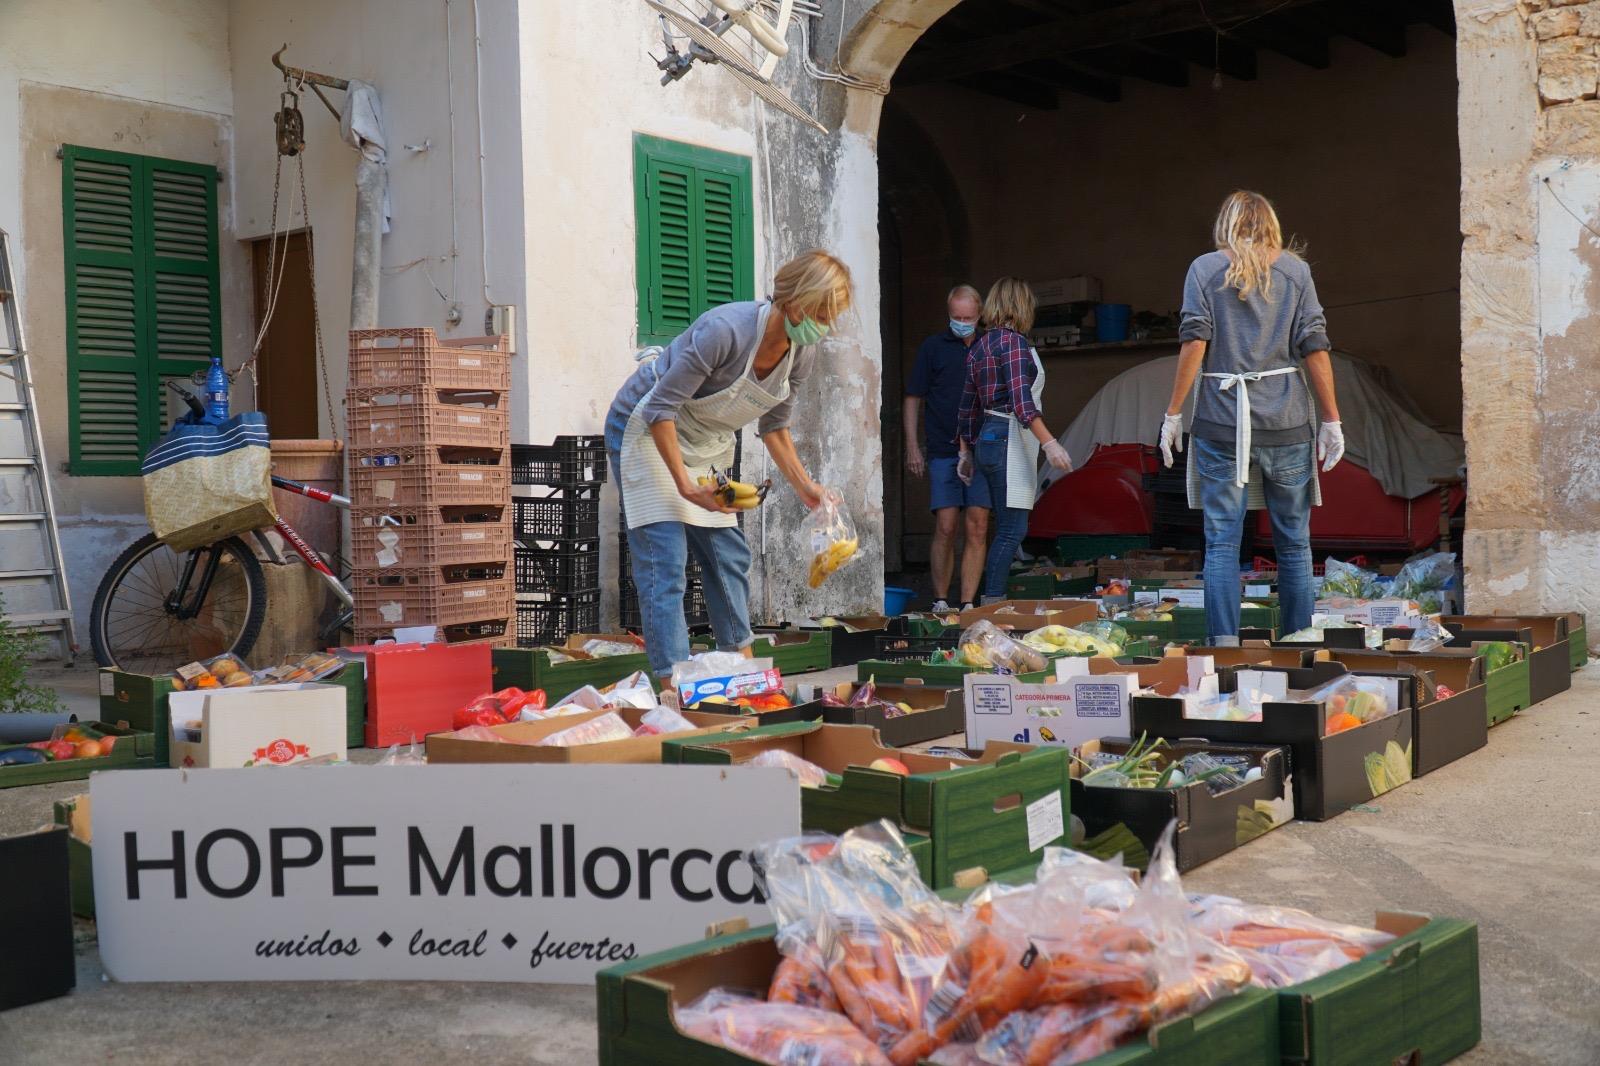 HOPE Mallorca